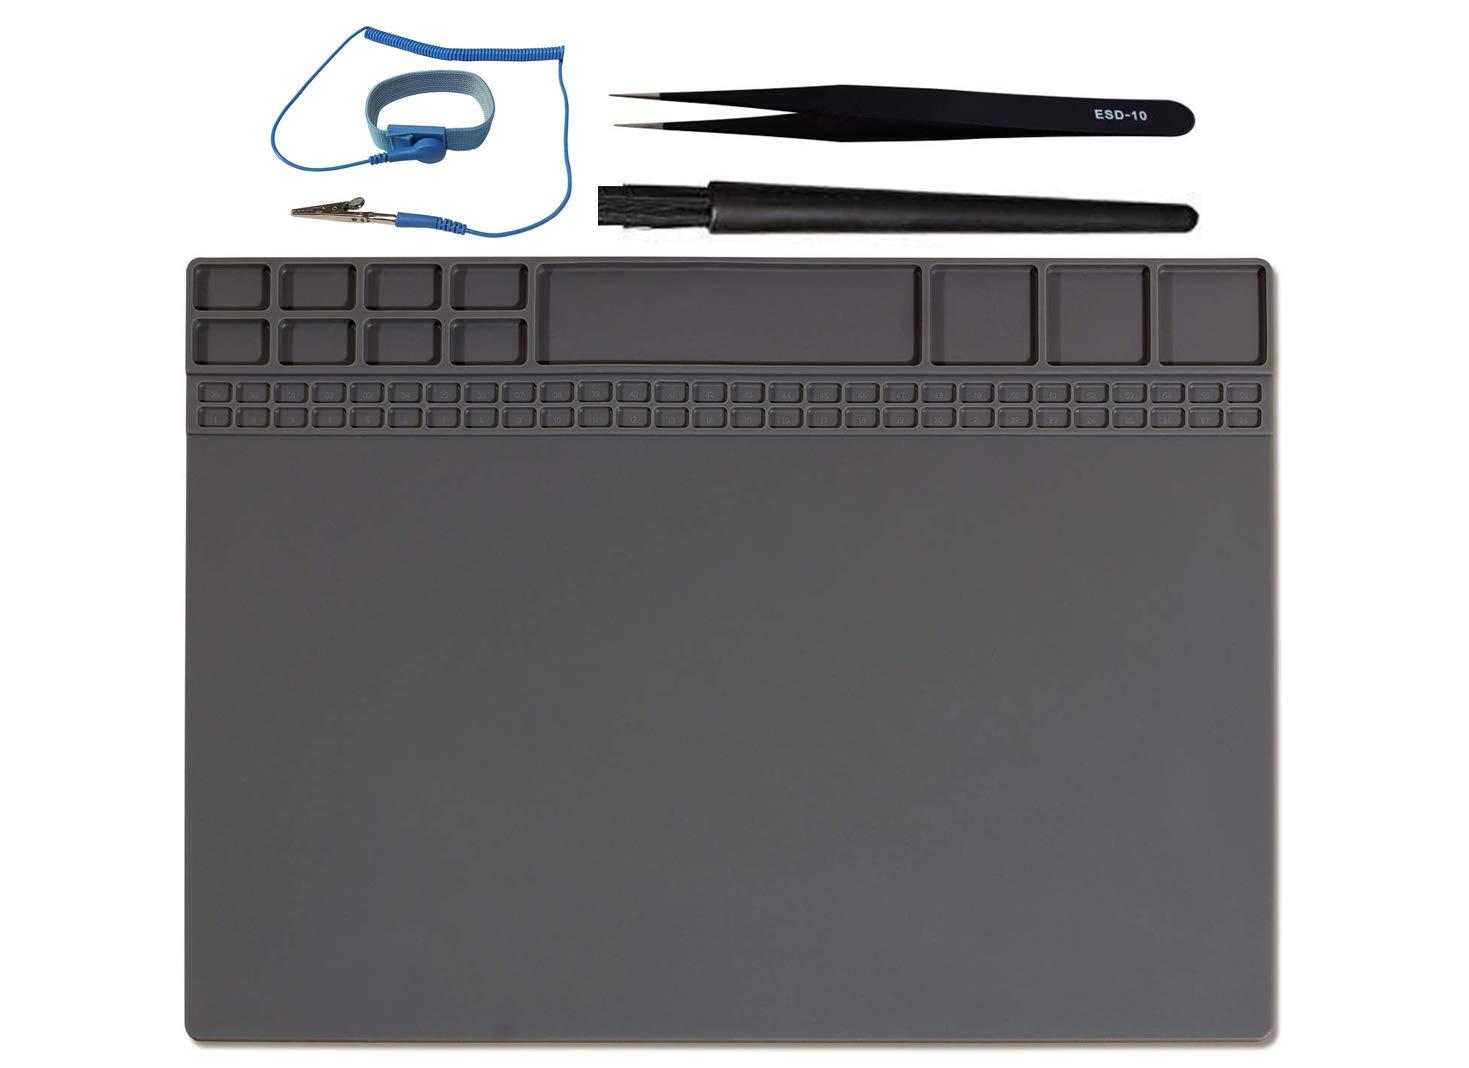 "Anti-Static Mat Work Mat Repair Work Mat and 3 Auxiliary Tools, Anti-Static Wrist and Tweezers and Brush 932°F Heat Resistant 15.9"" x 12"" inch Grey"